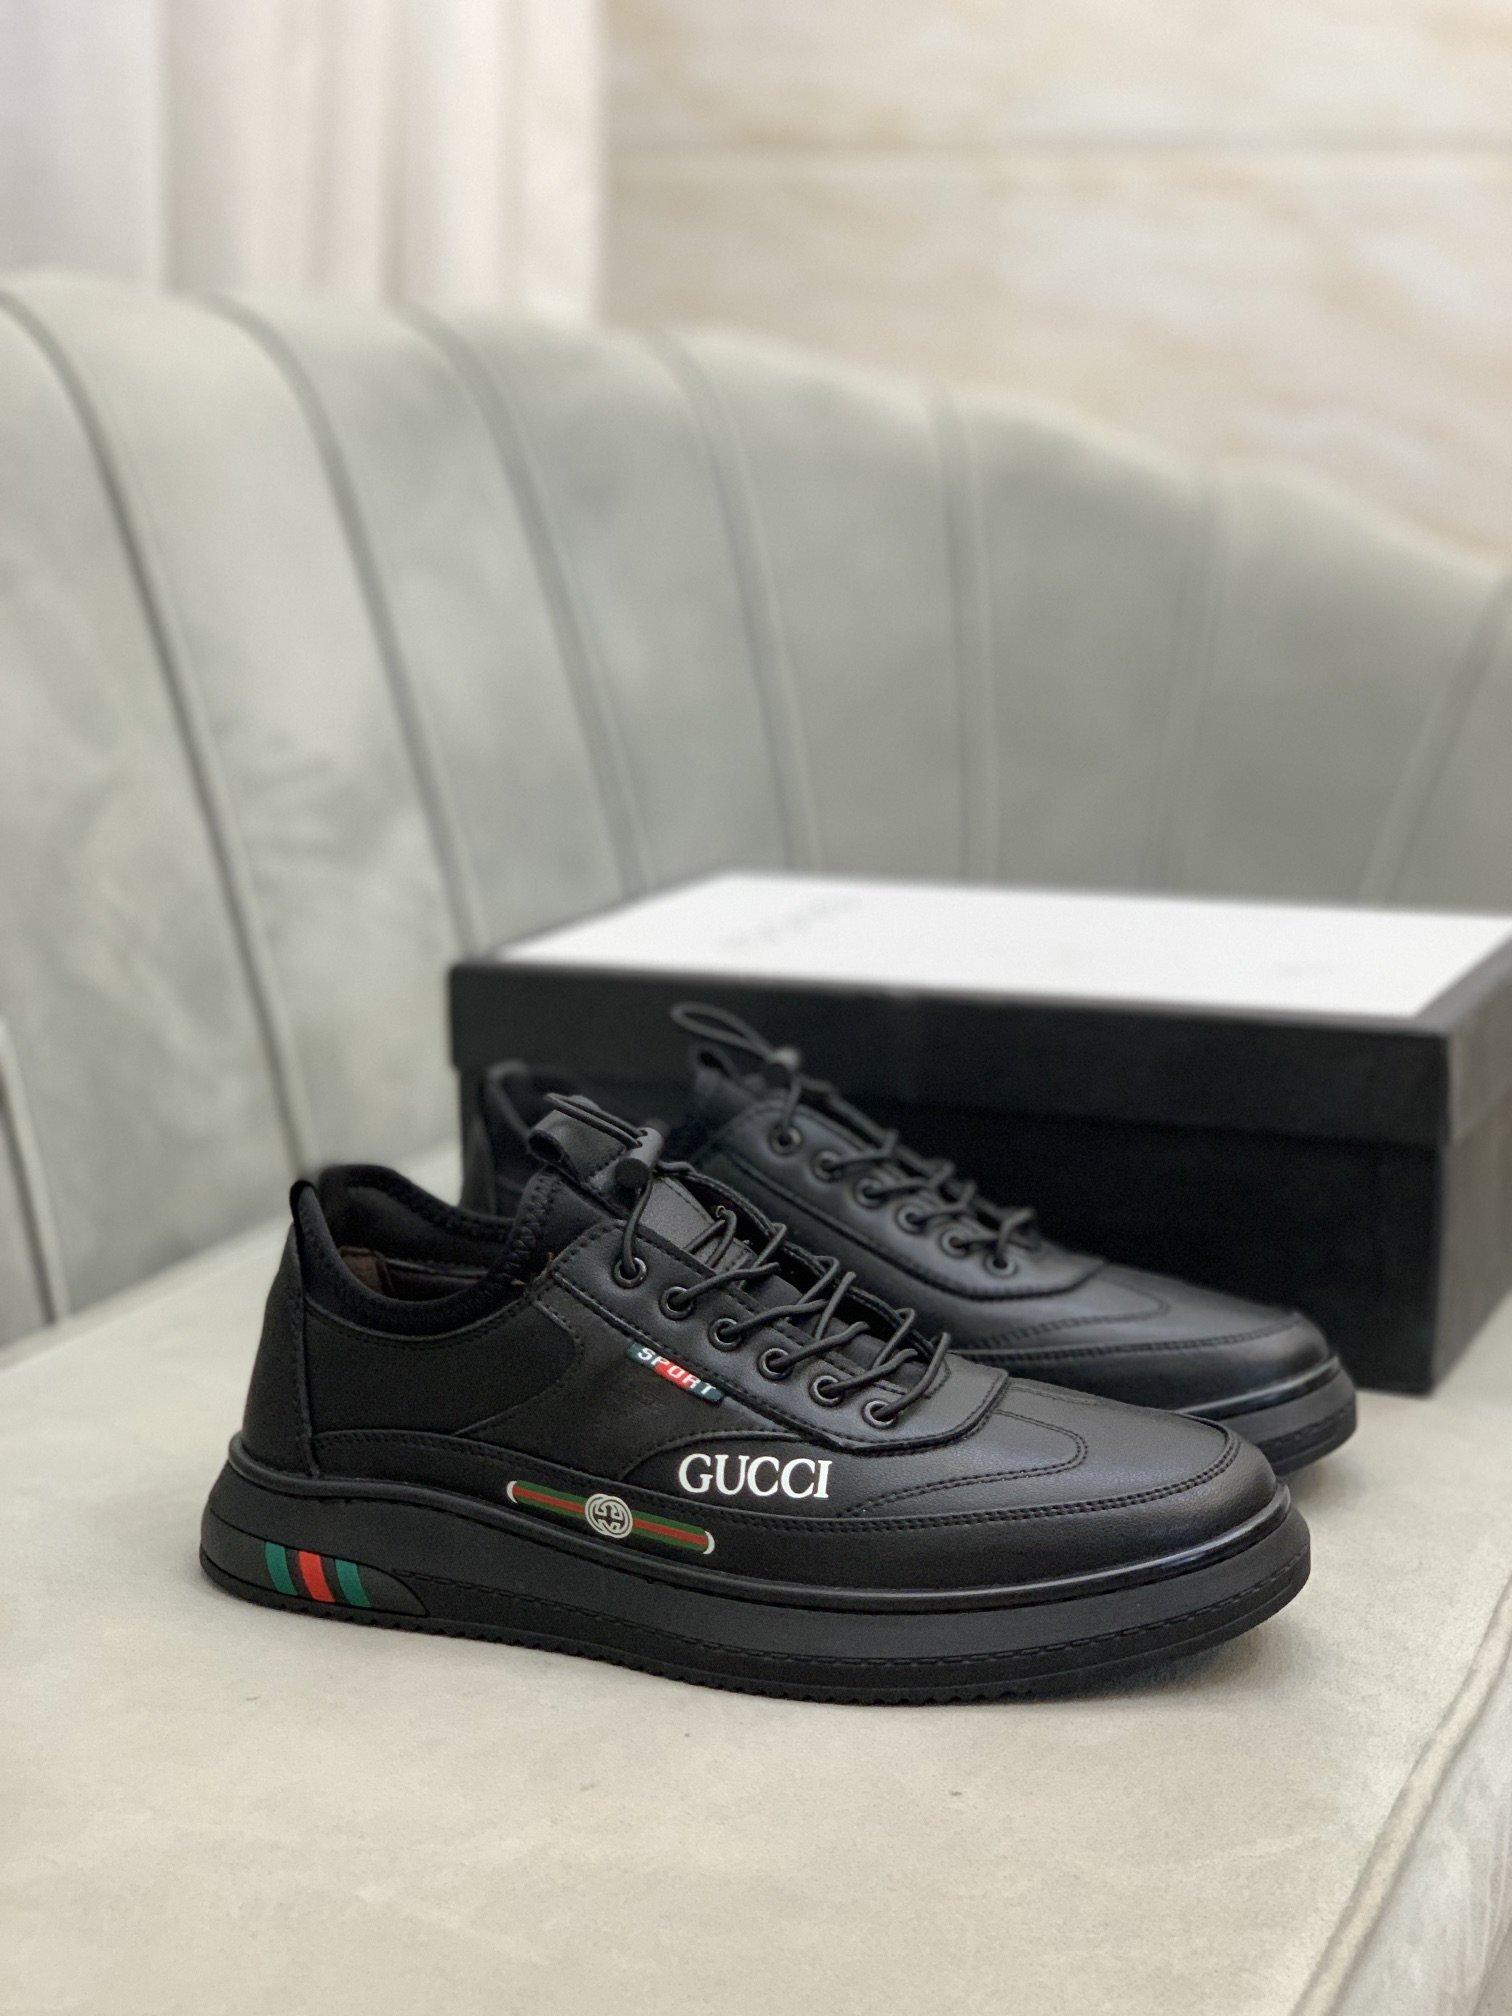 Gucc*古奇*低帮休闲鞋正码码数: